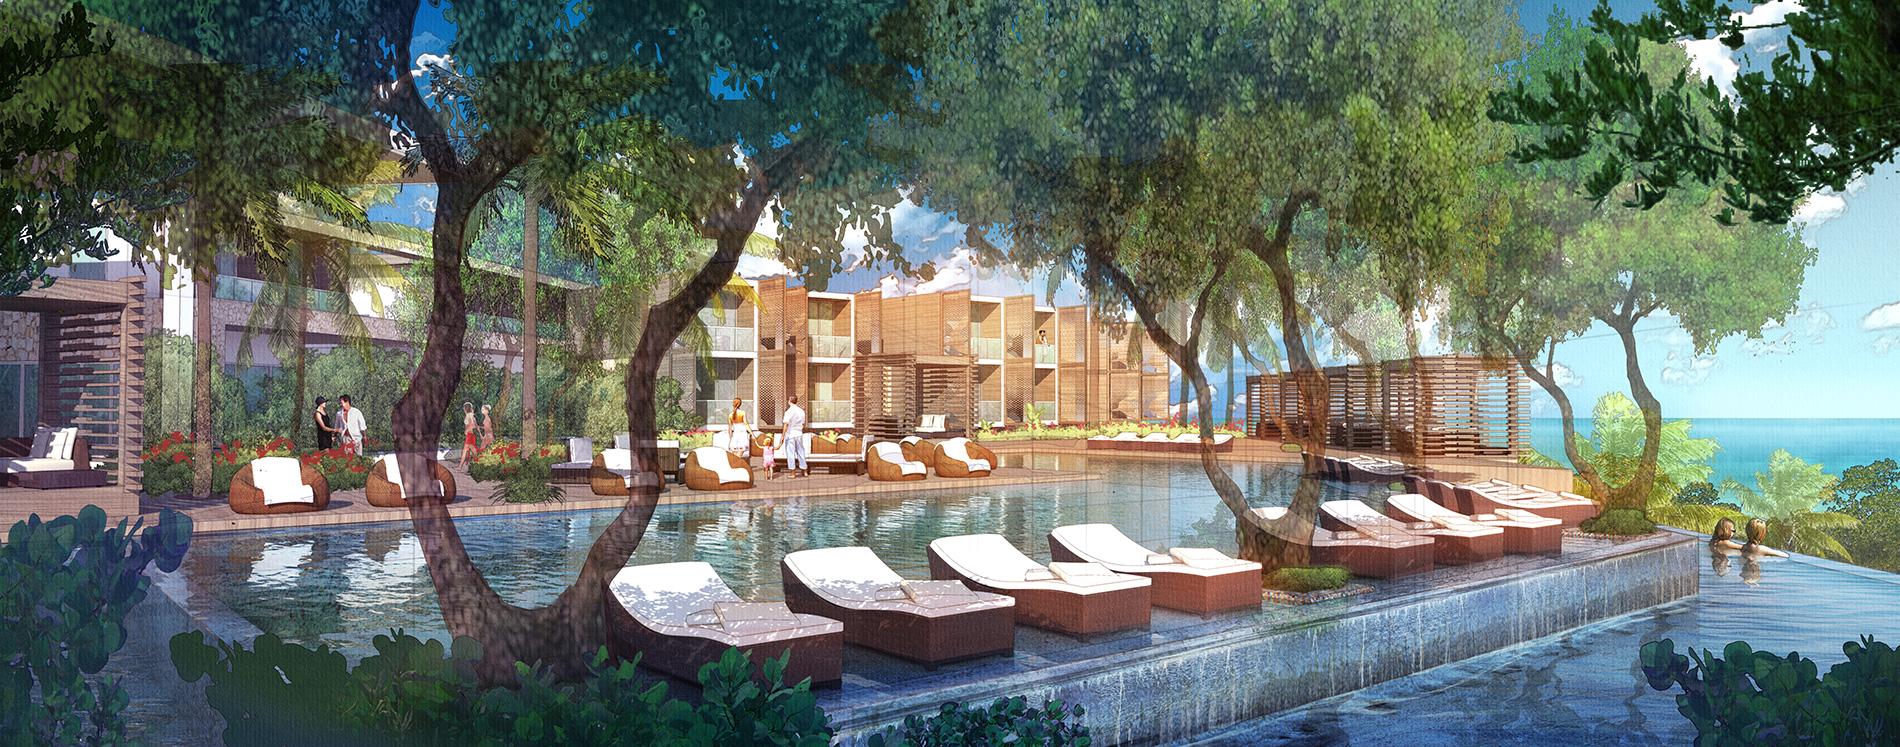 CaymanBrac_Hotel_web.jpg